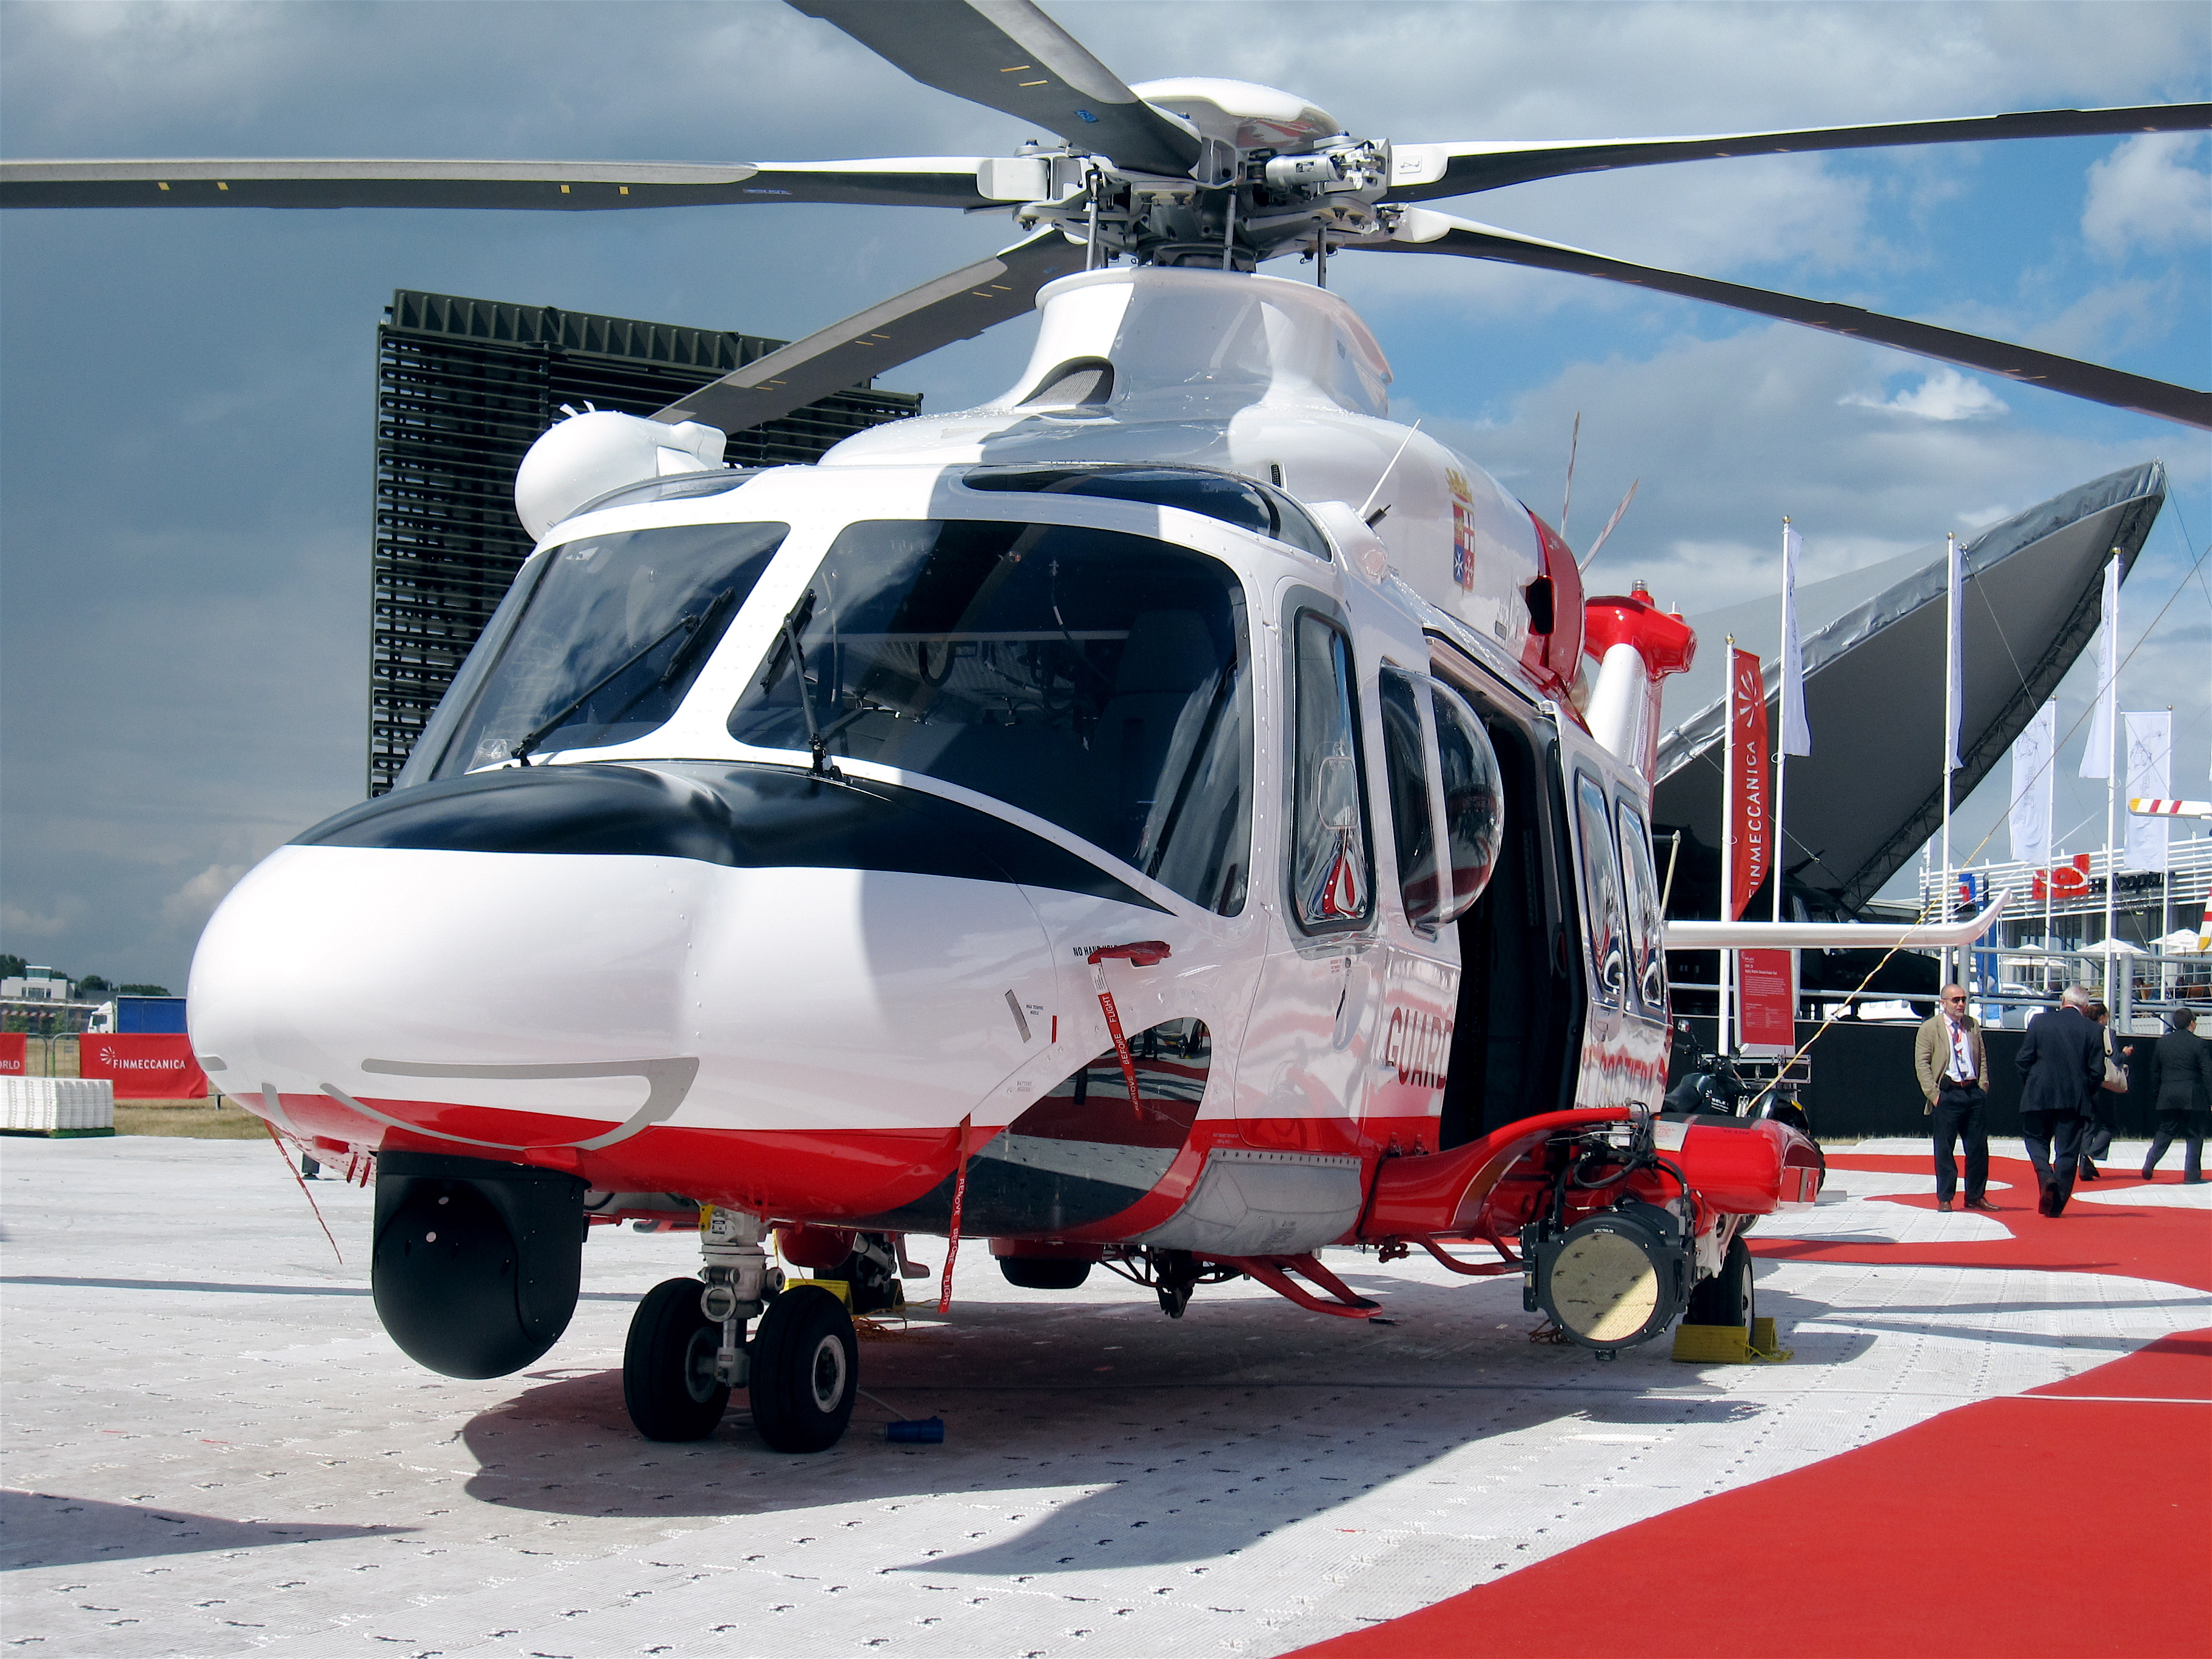 AgustaWestland AW139. Источник: blogs.defensenews.com.